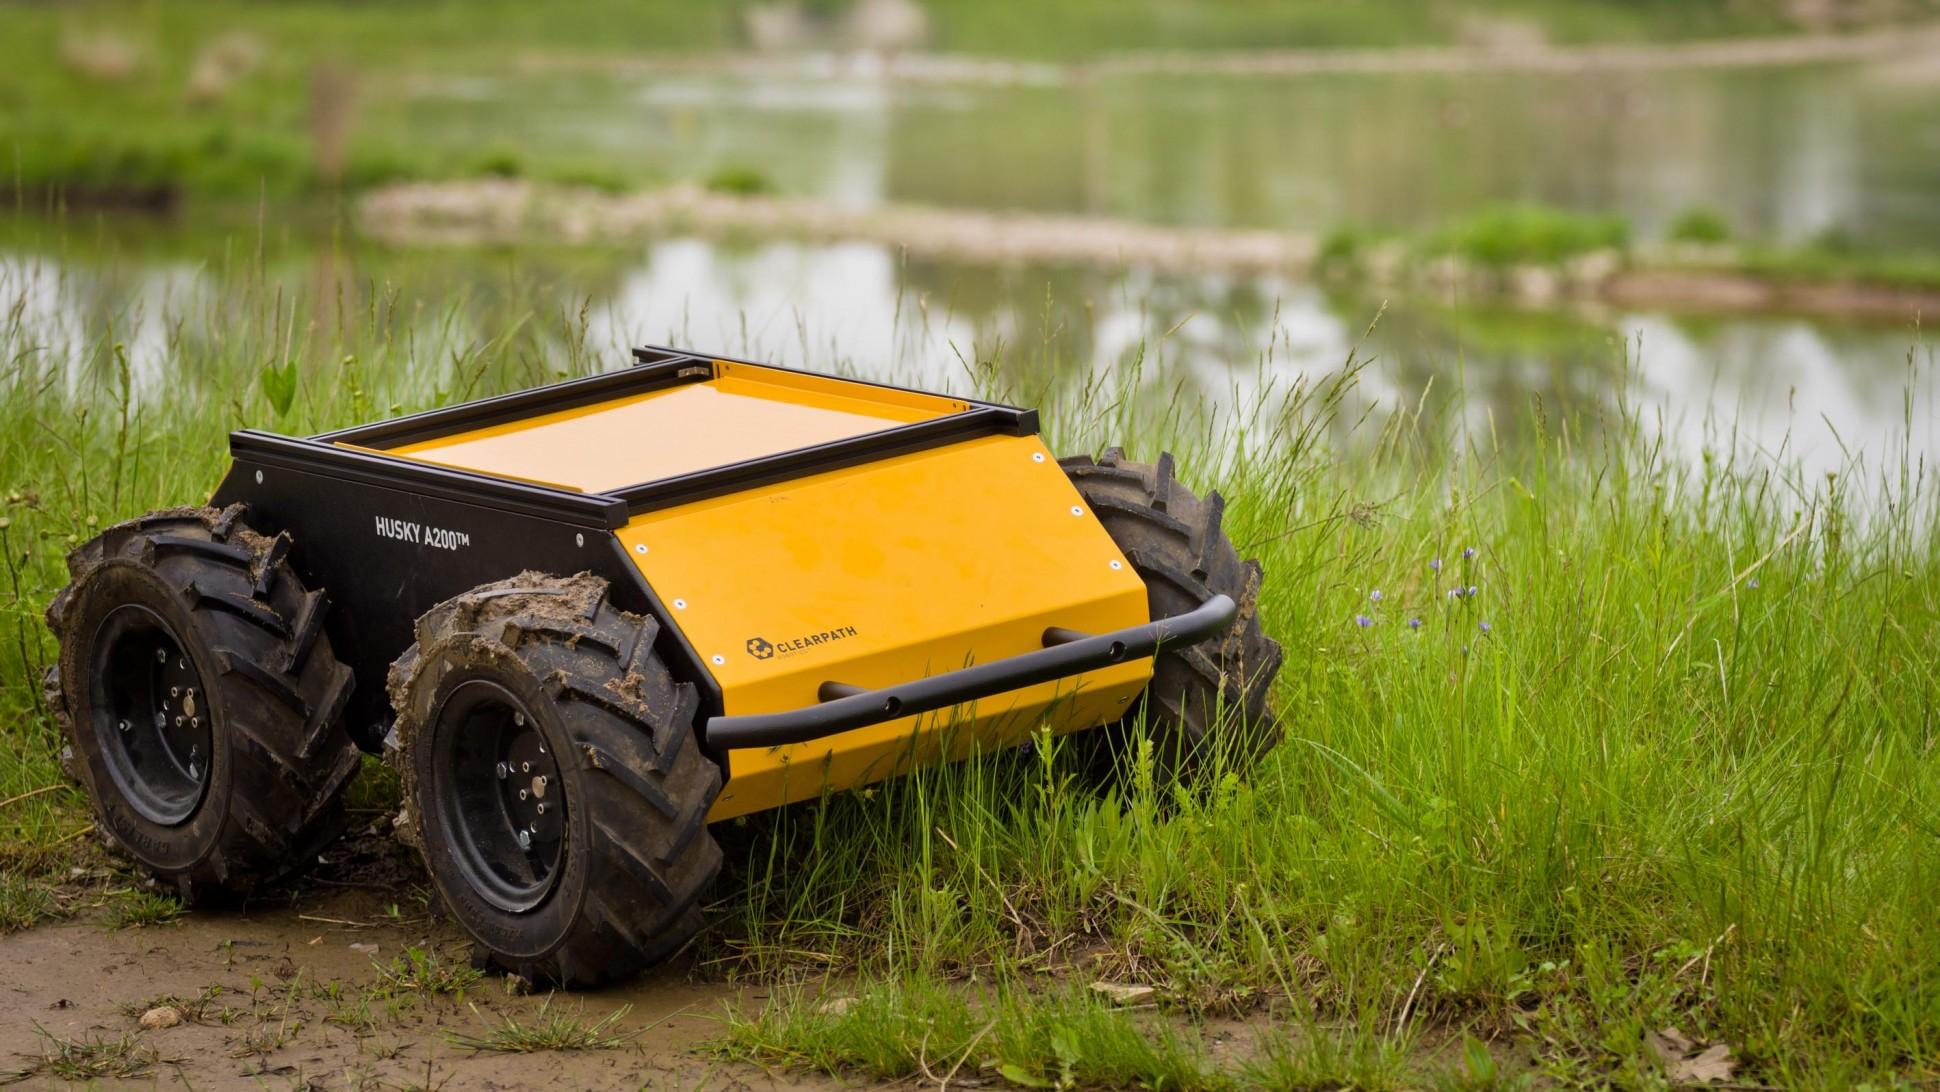 Clearpath-Robotics-Husky-e1426720202779-1940x1092.jpg